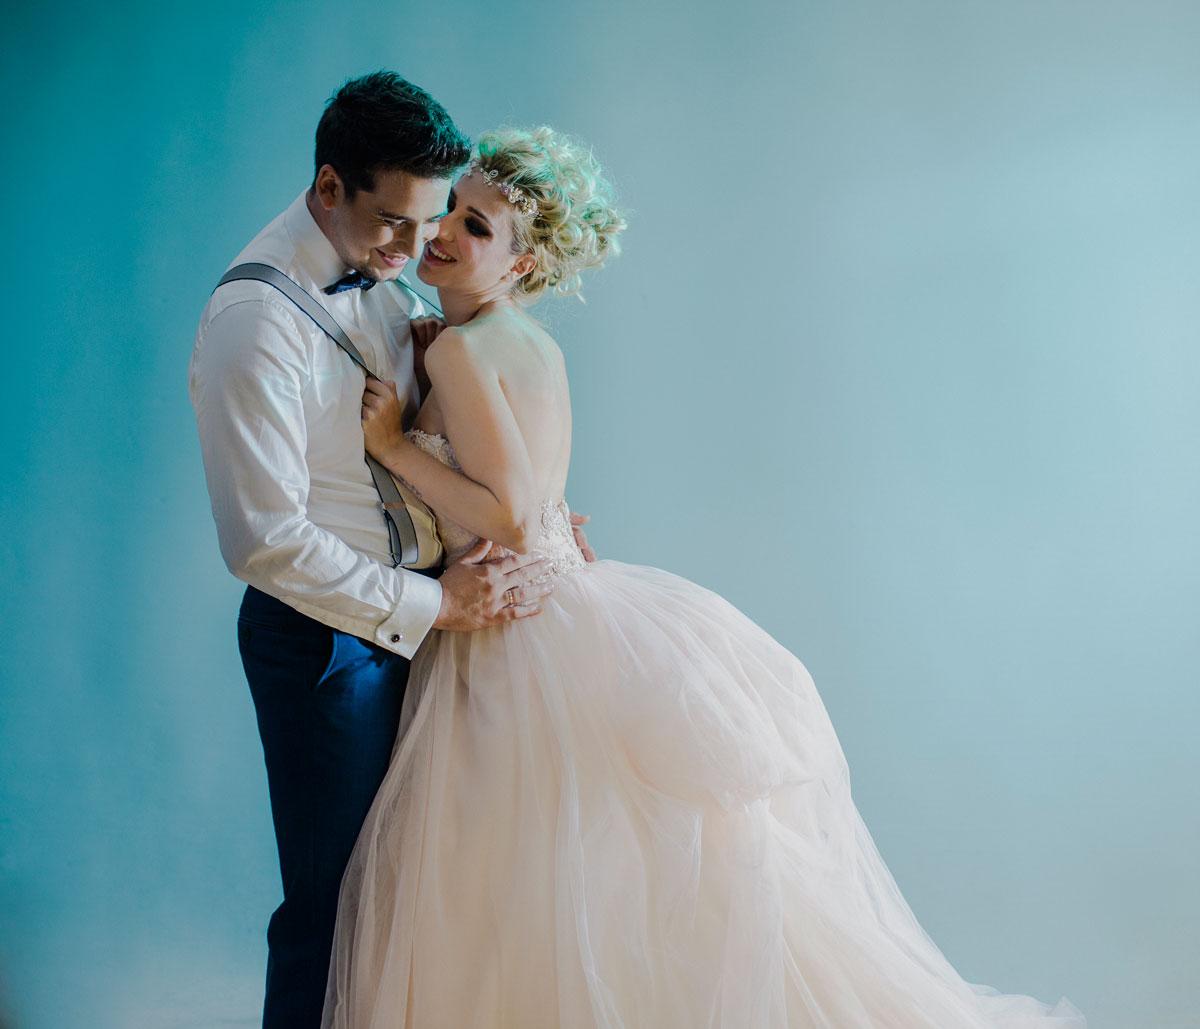 miguel Barranco fotografo de bodas en Málaga, fotografia de estudio para bodas